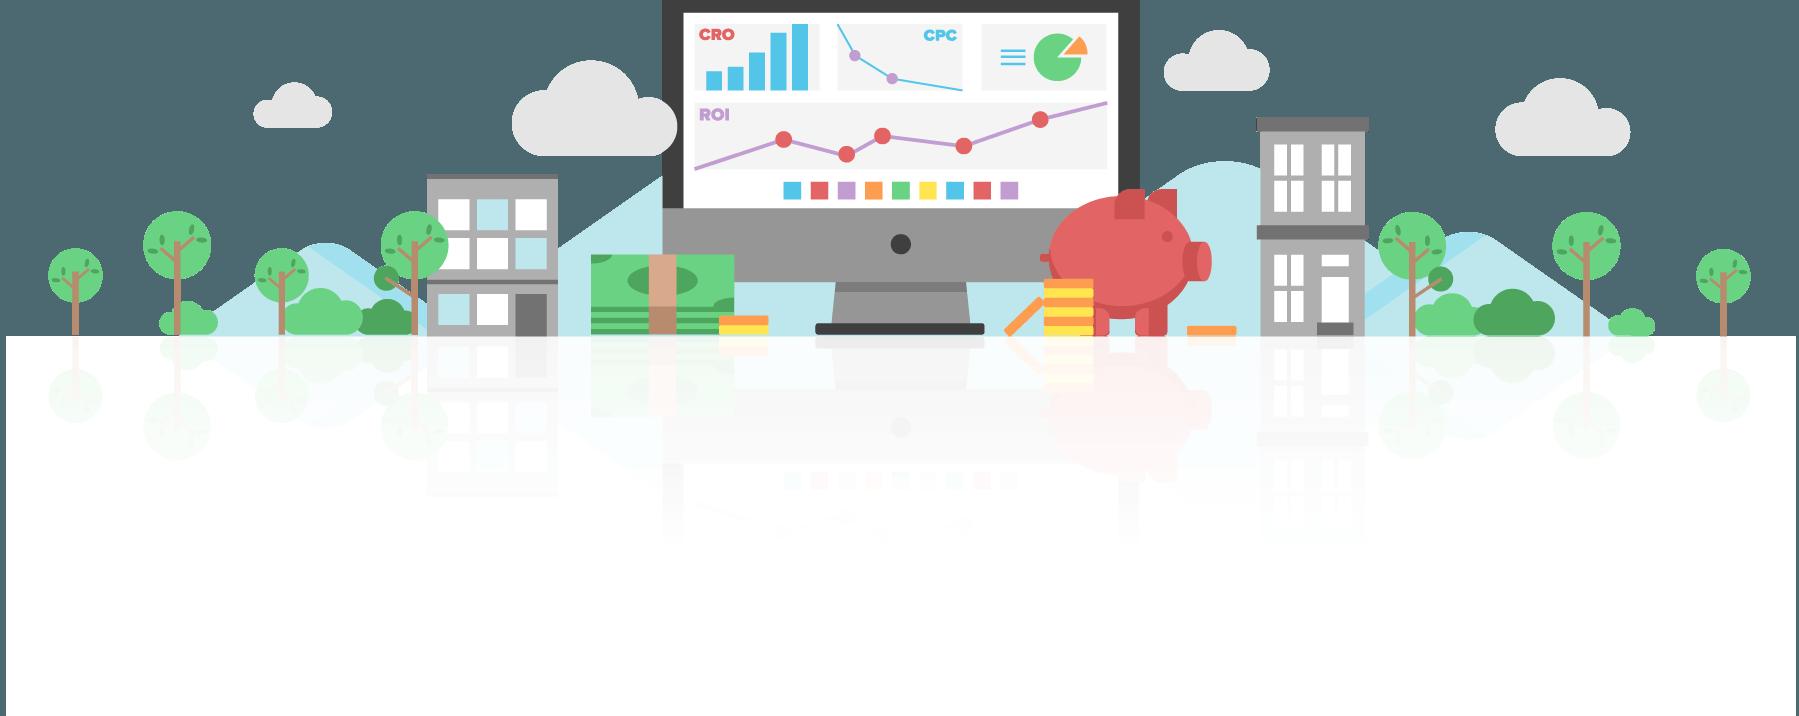 CRO ROI CPC Analytics Graphic - Disruptive Advertising